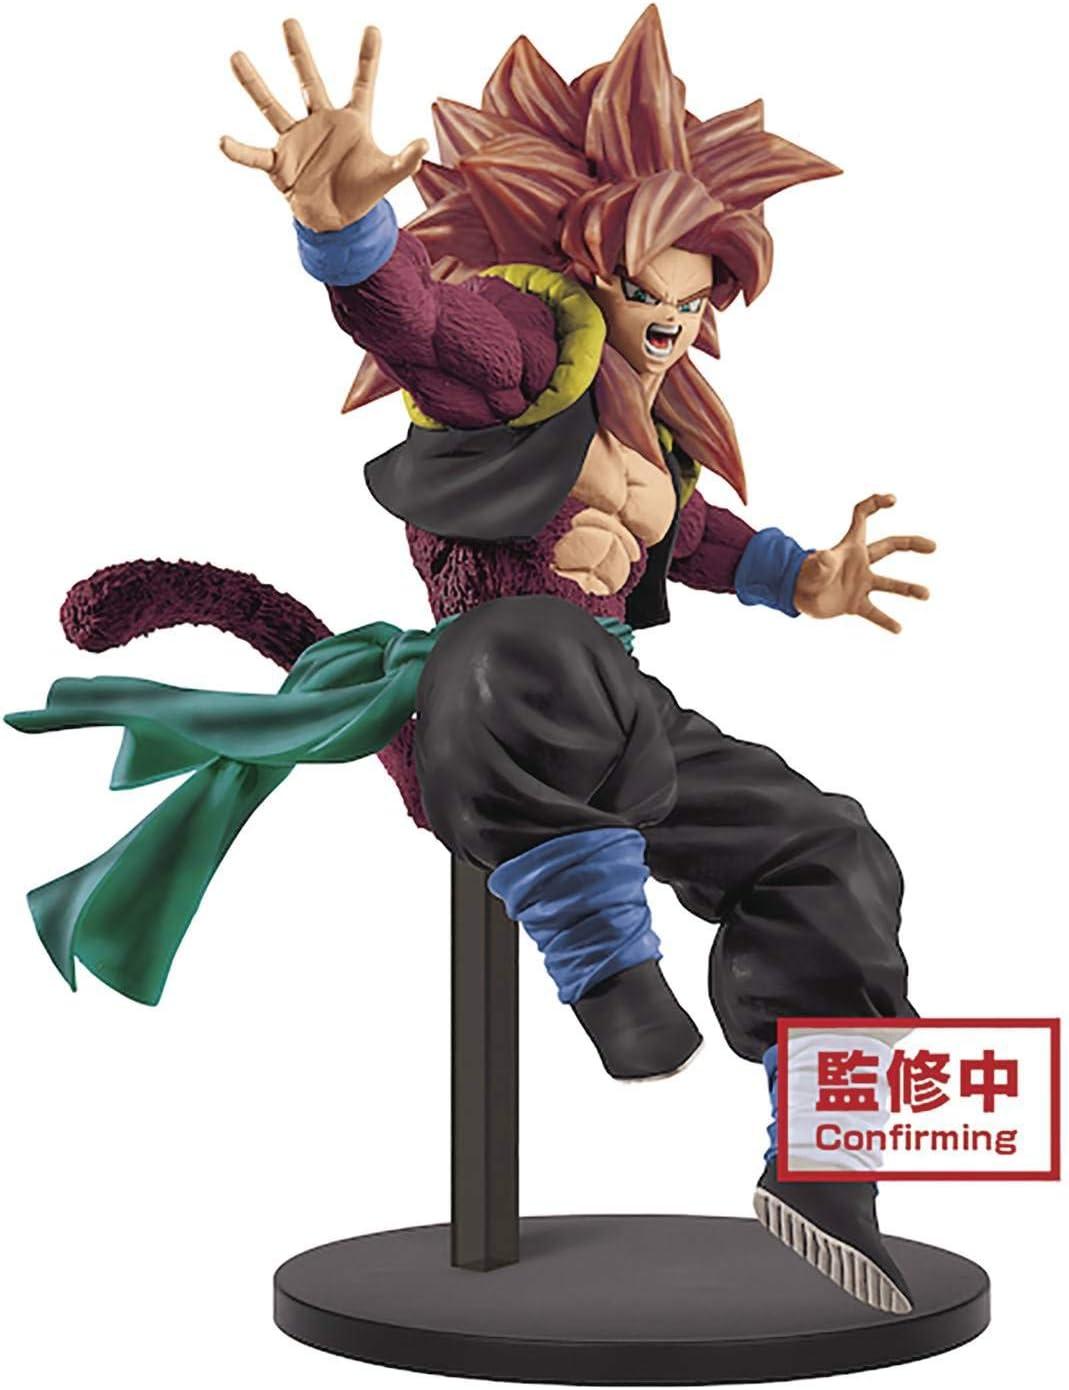 Amazon Com Super Dragon Ball Heroes 9th Anniversary Figure Super Saiyan 4 Gogeta Xeno Multiple Colors Toys Games